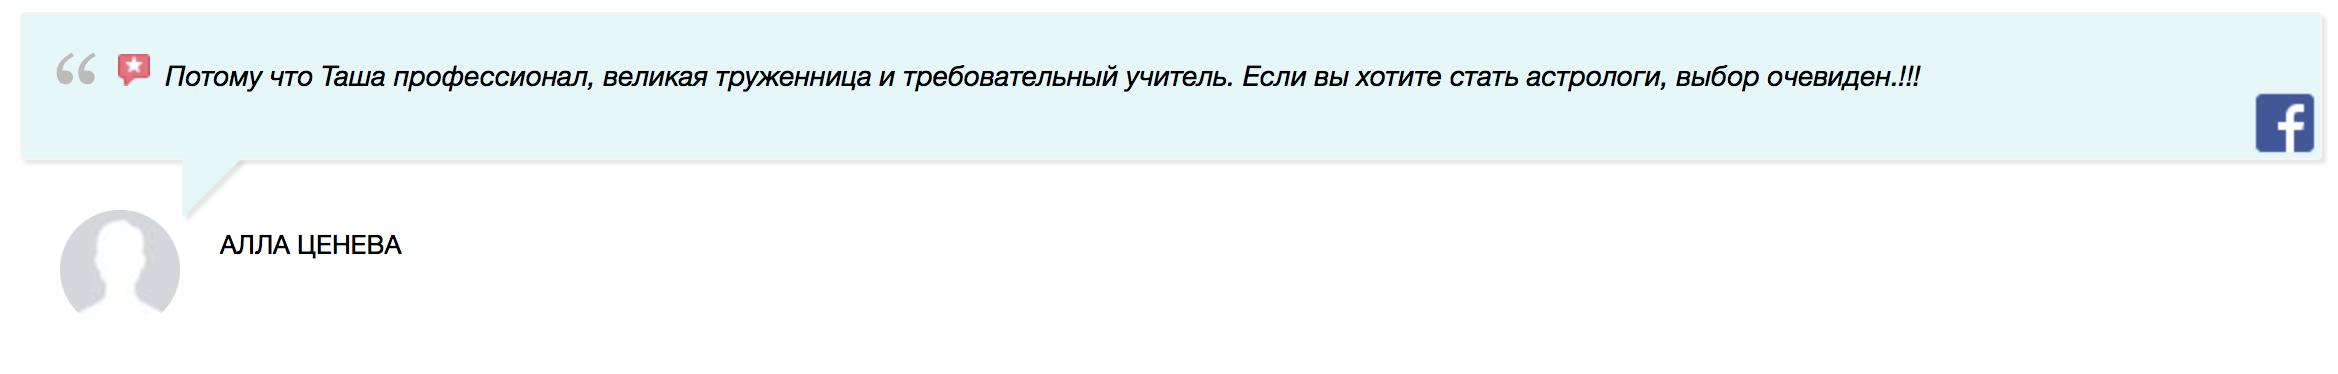 https://astrologtasha.ru/wp-content/uploads/2021/02/Screen-Shot-2021-02-09-at-12.07.16-PM.png